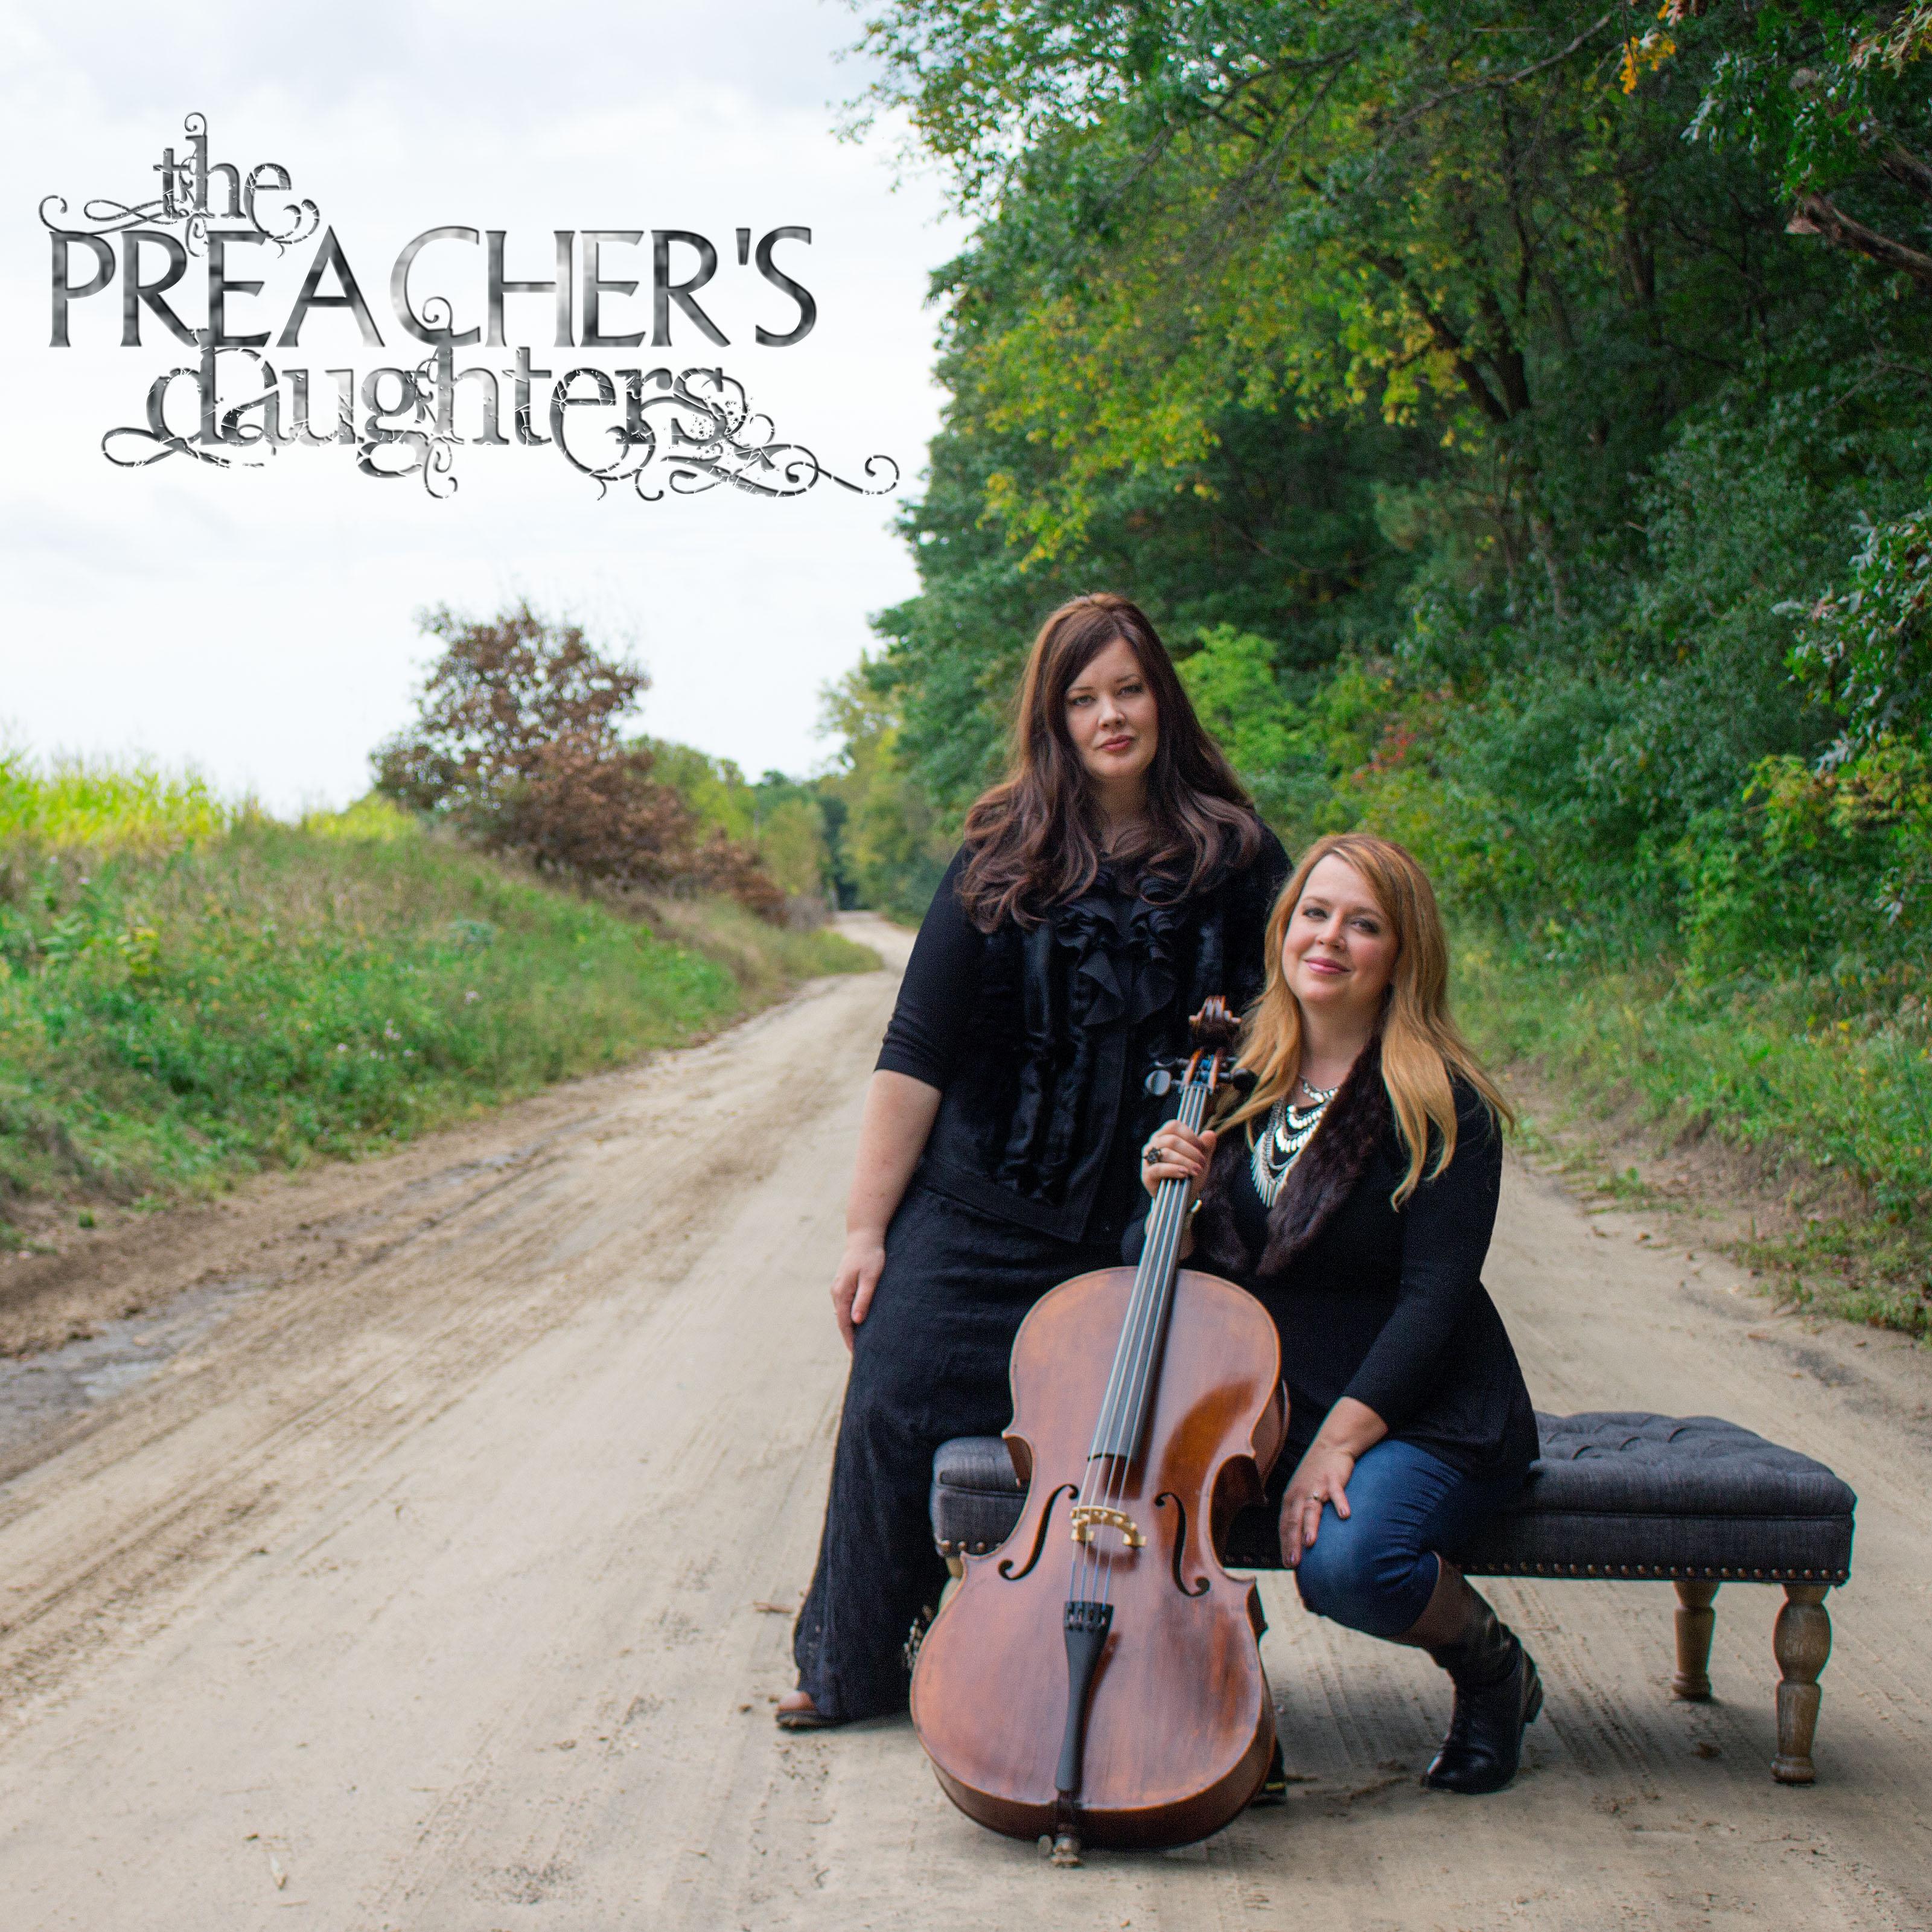 The Preacher's Daughters @ Capital Christian Center   Bismarck   North Dakota   United States